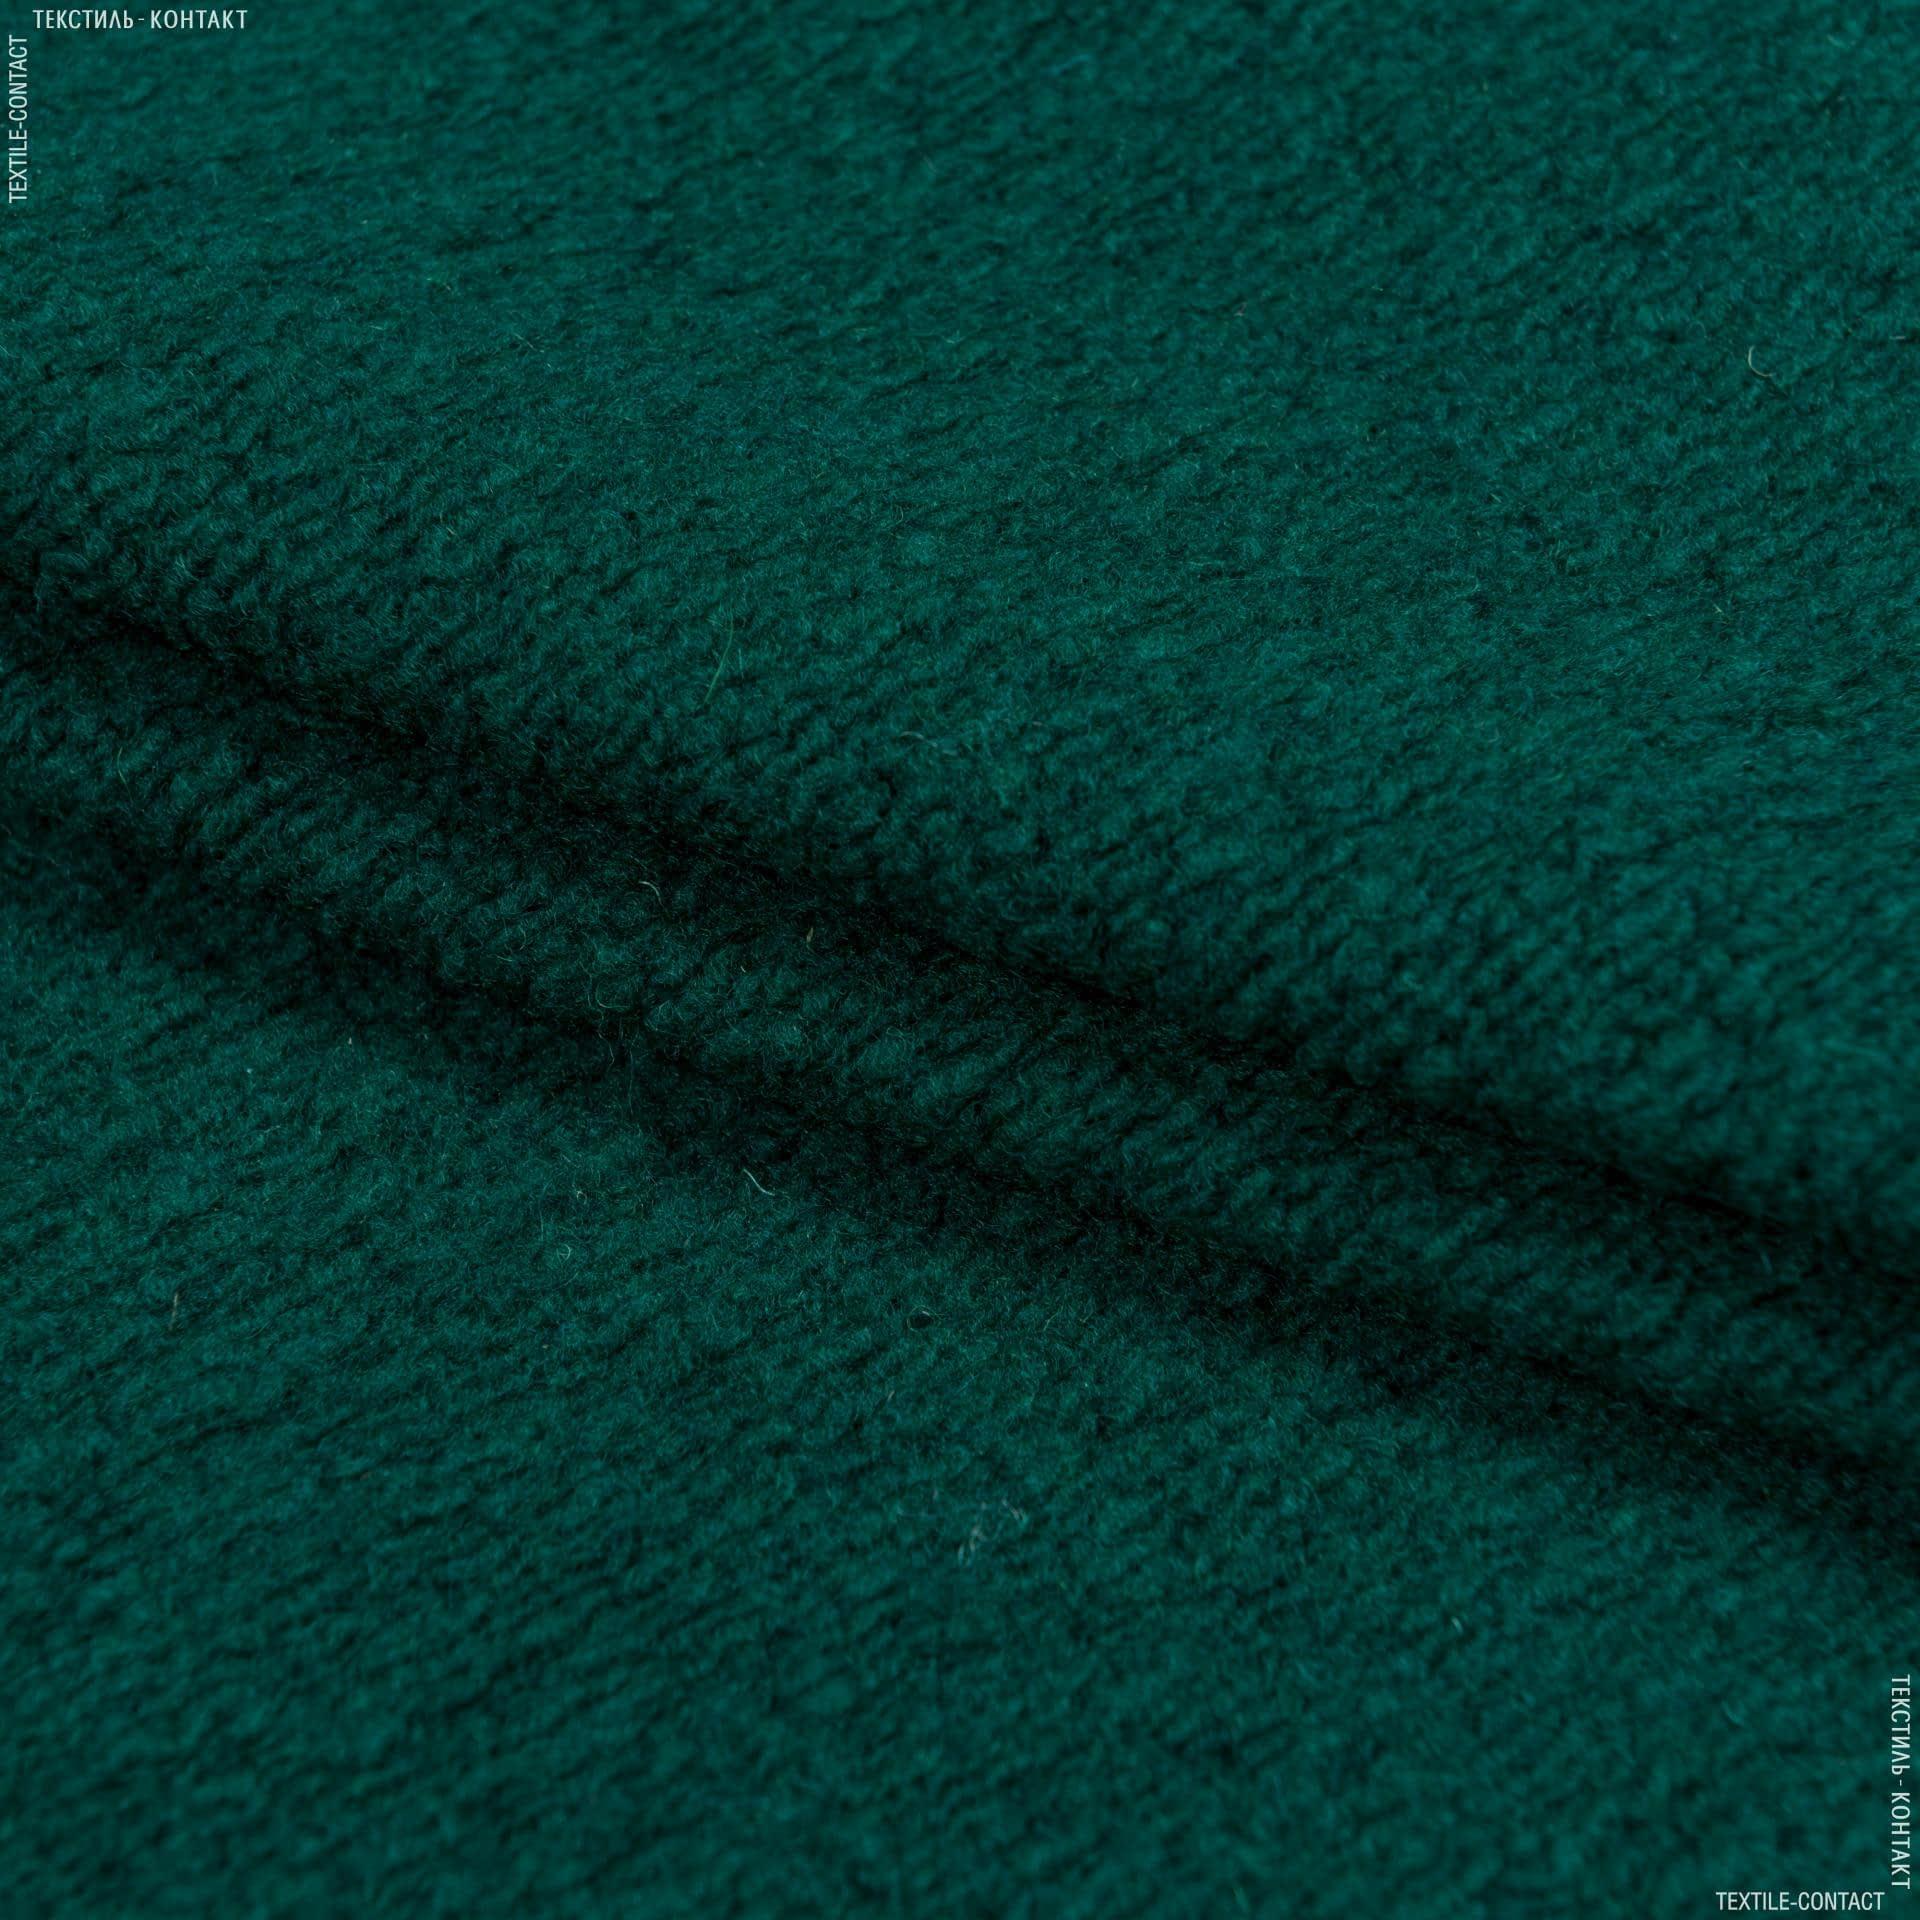 Тканини для верхнього одягу - Трикотаж букле смарагдовий